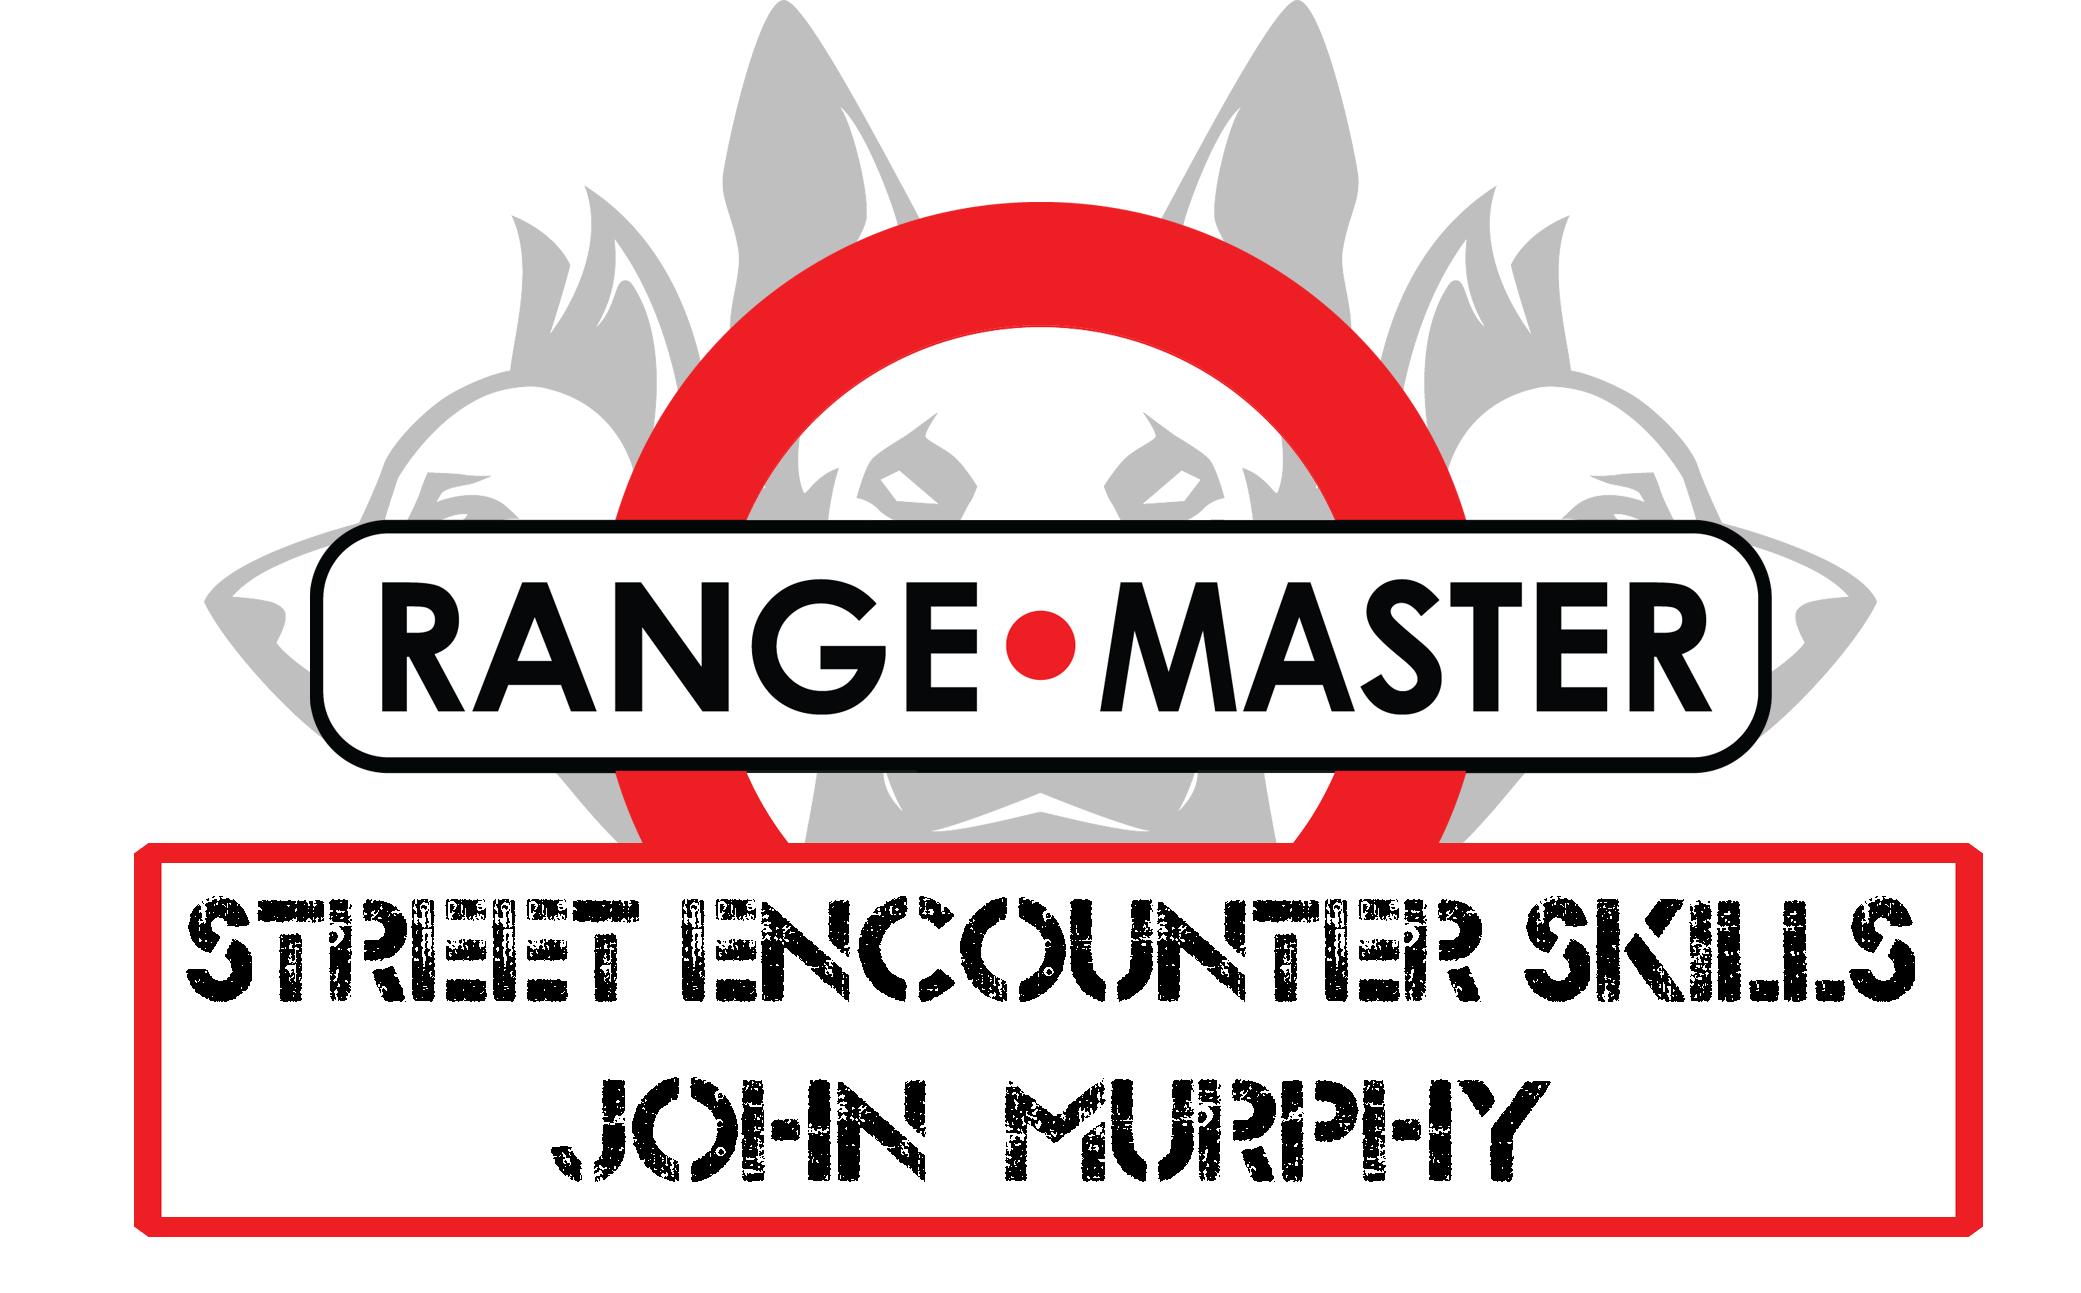 street encounter skills  john murphy rangemaster   review short barrel shepherd